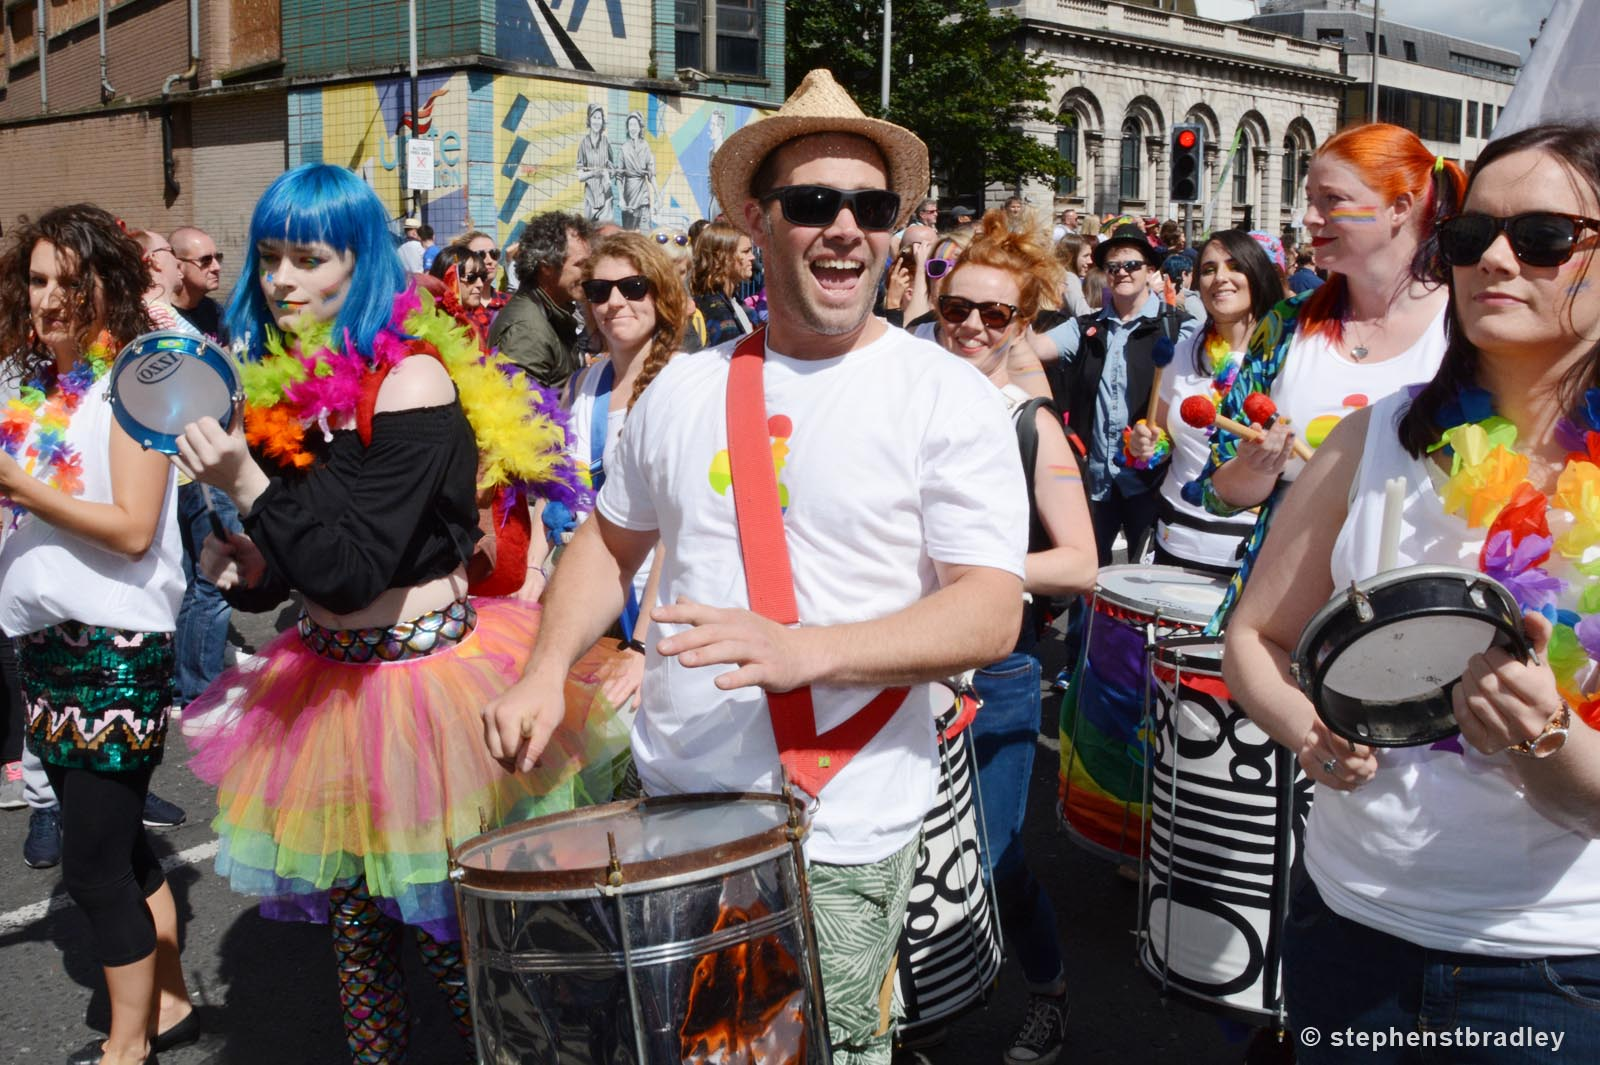 Editorial photographer Dublin portfolio photo 8571 of Belfast Pride Parade by Stephen S T Bradley